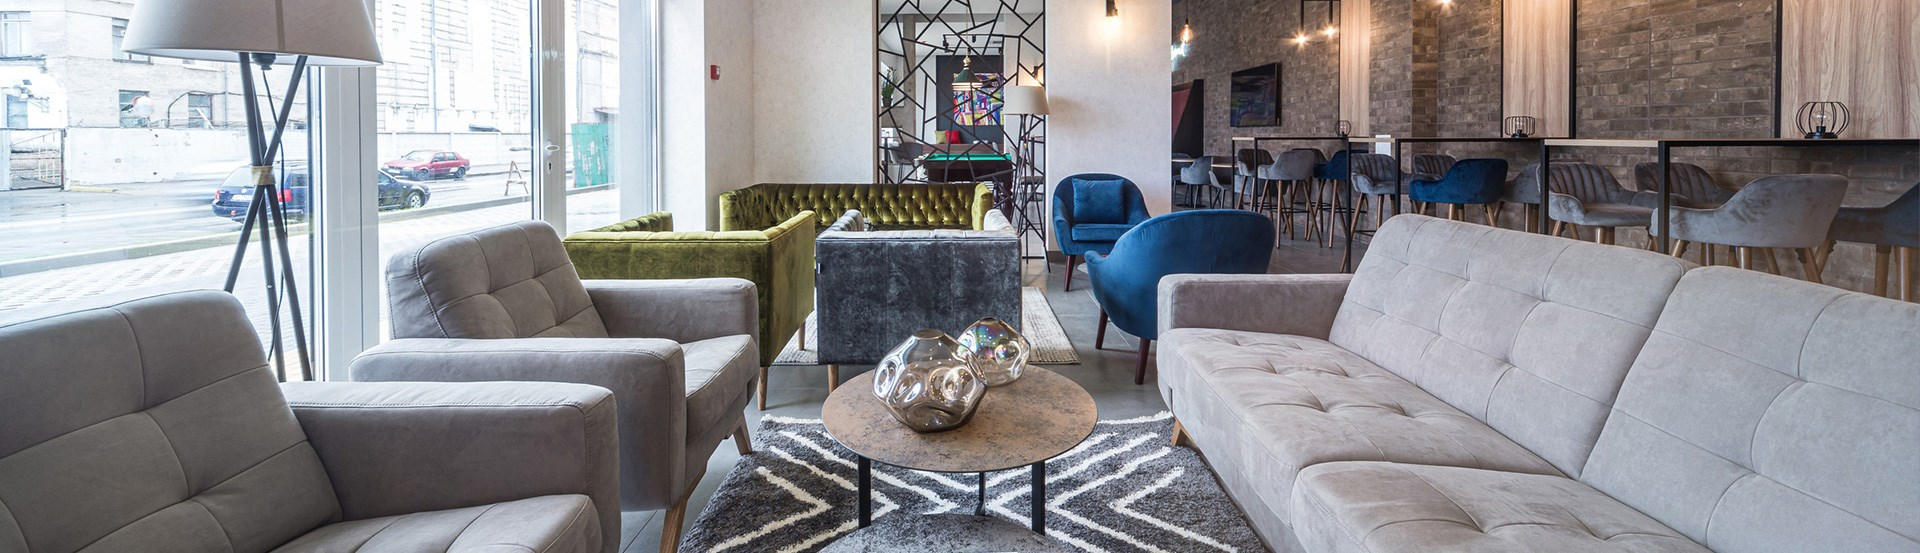 Amarant Urban Hotel Kiev